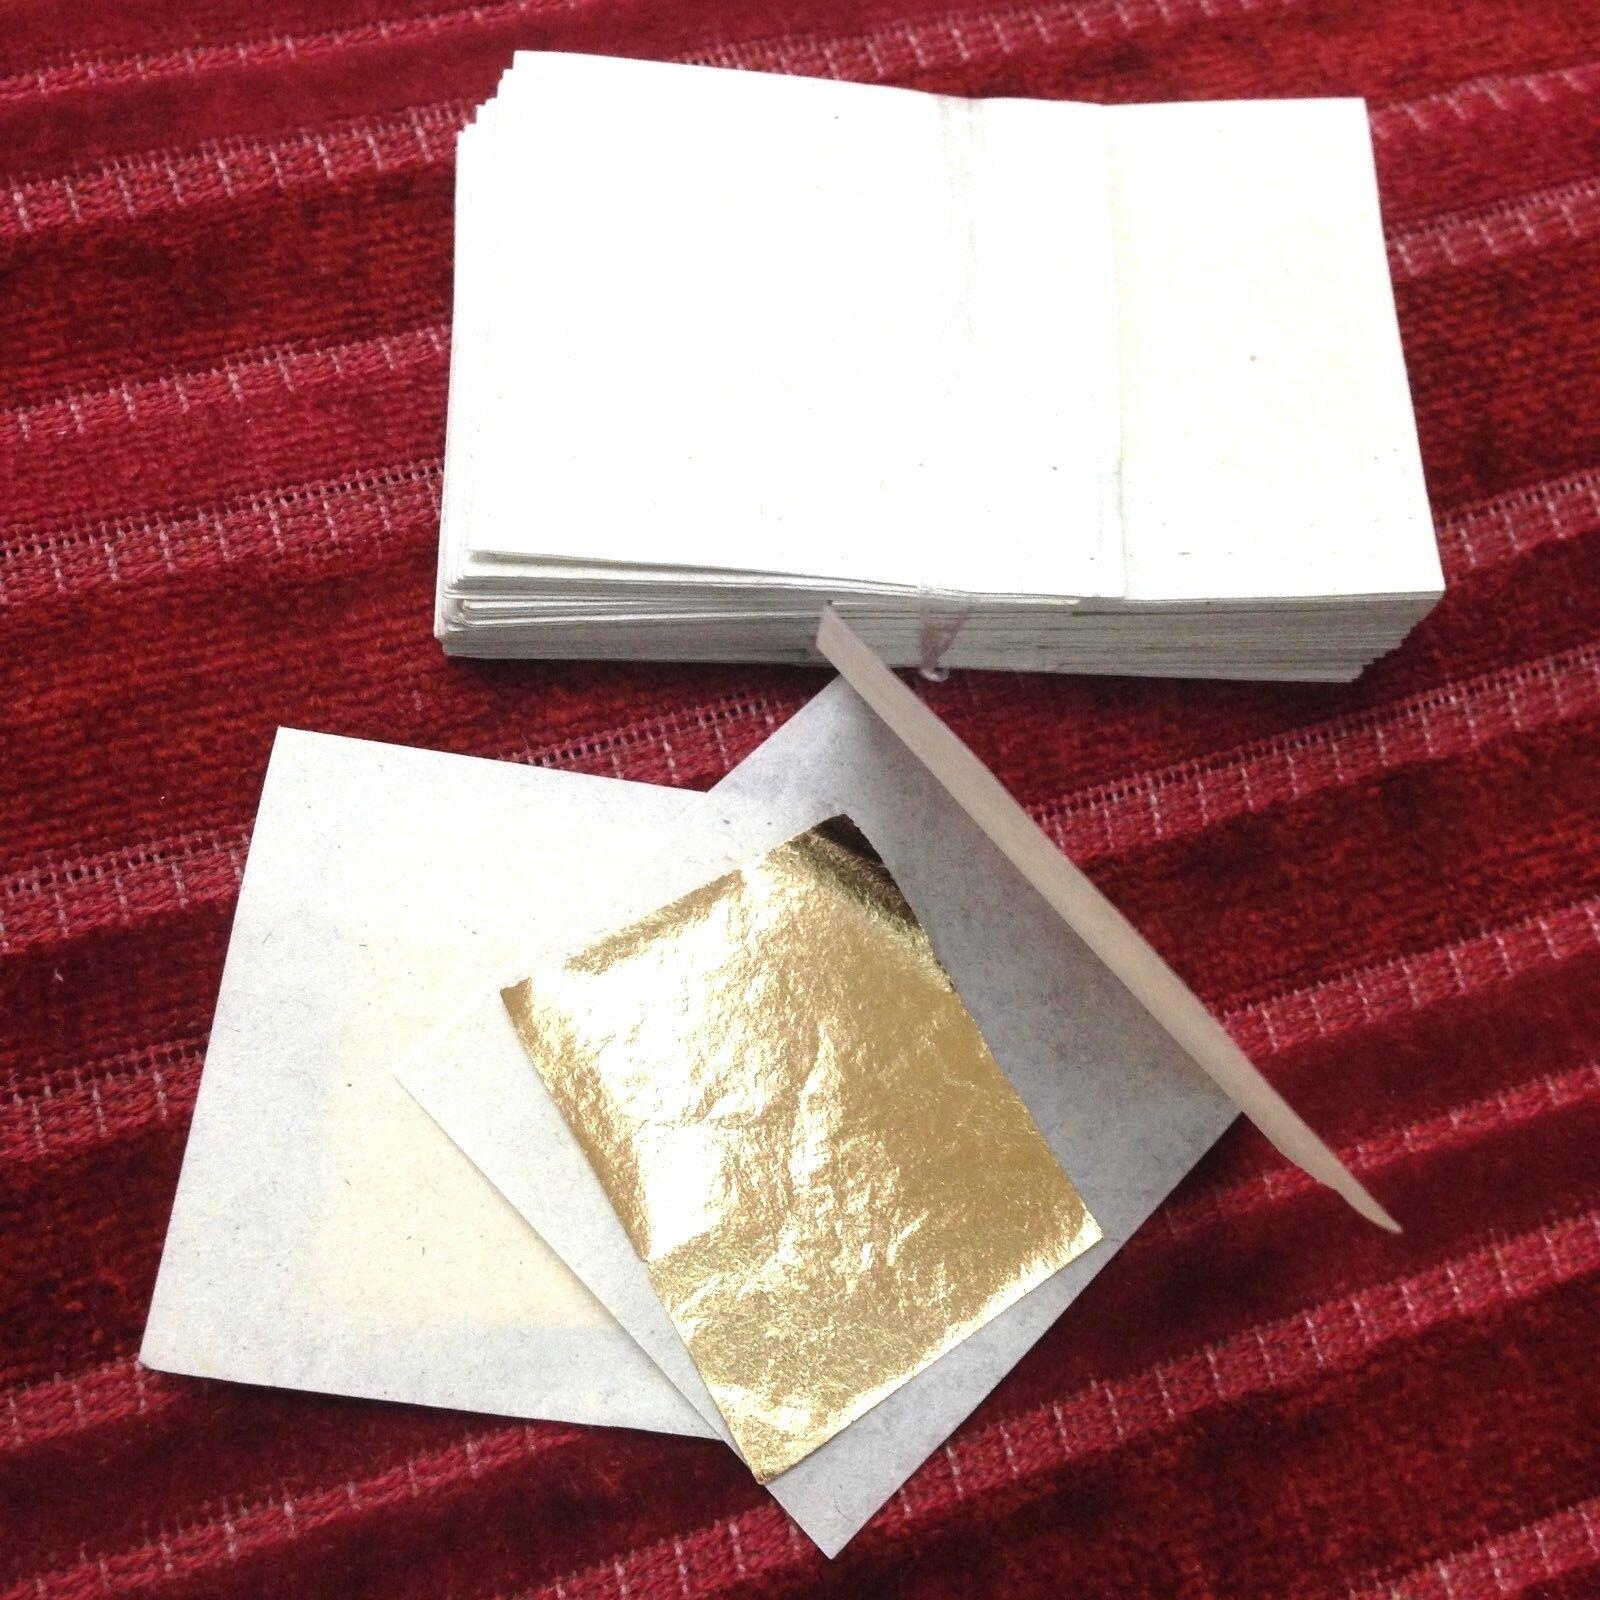 100 PCS MASK 24K PURE GOLD LEAF FACIAL ANTI AGING WRINKLE SKIN  WHOLESALE SPA